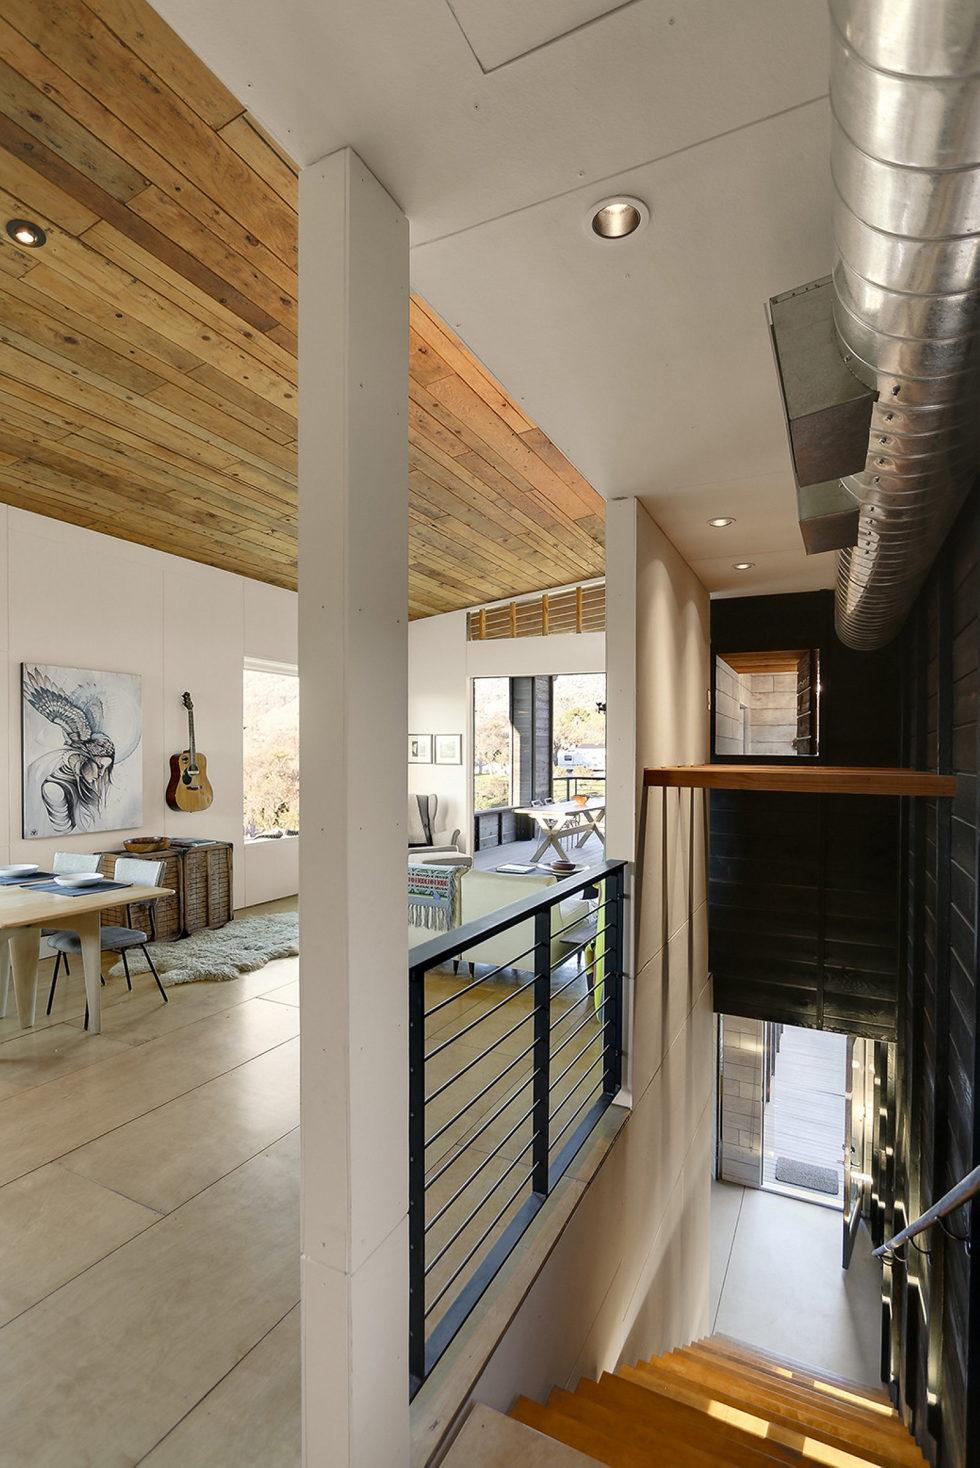 510 Cabin The Country House From Hunter Leggitt Studio In The USA 5